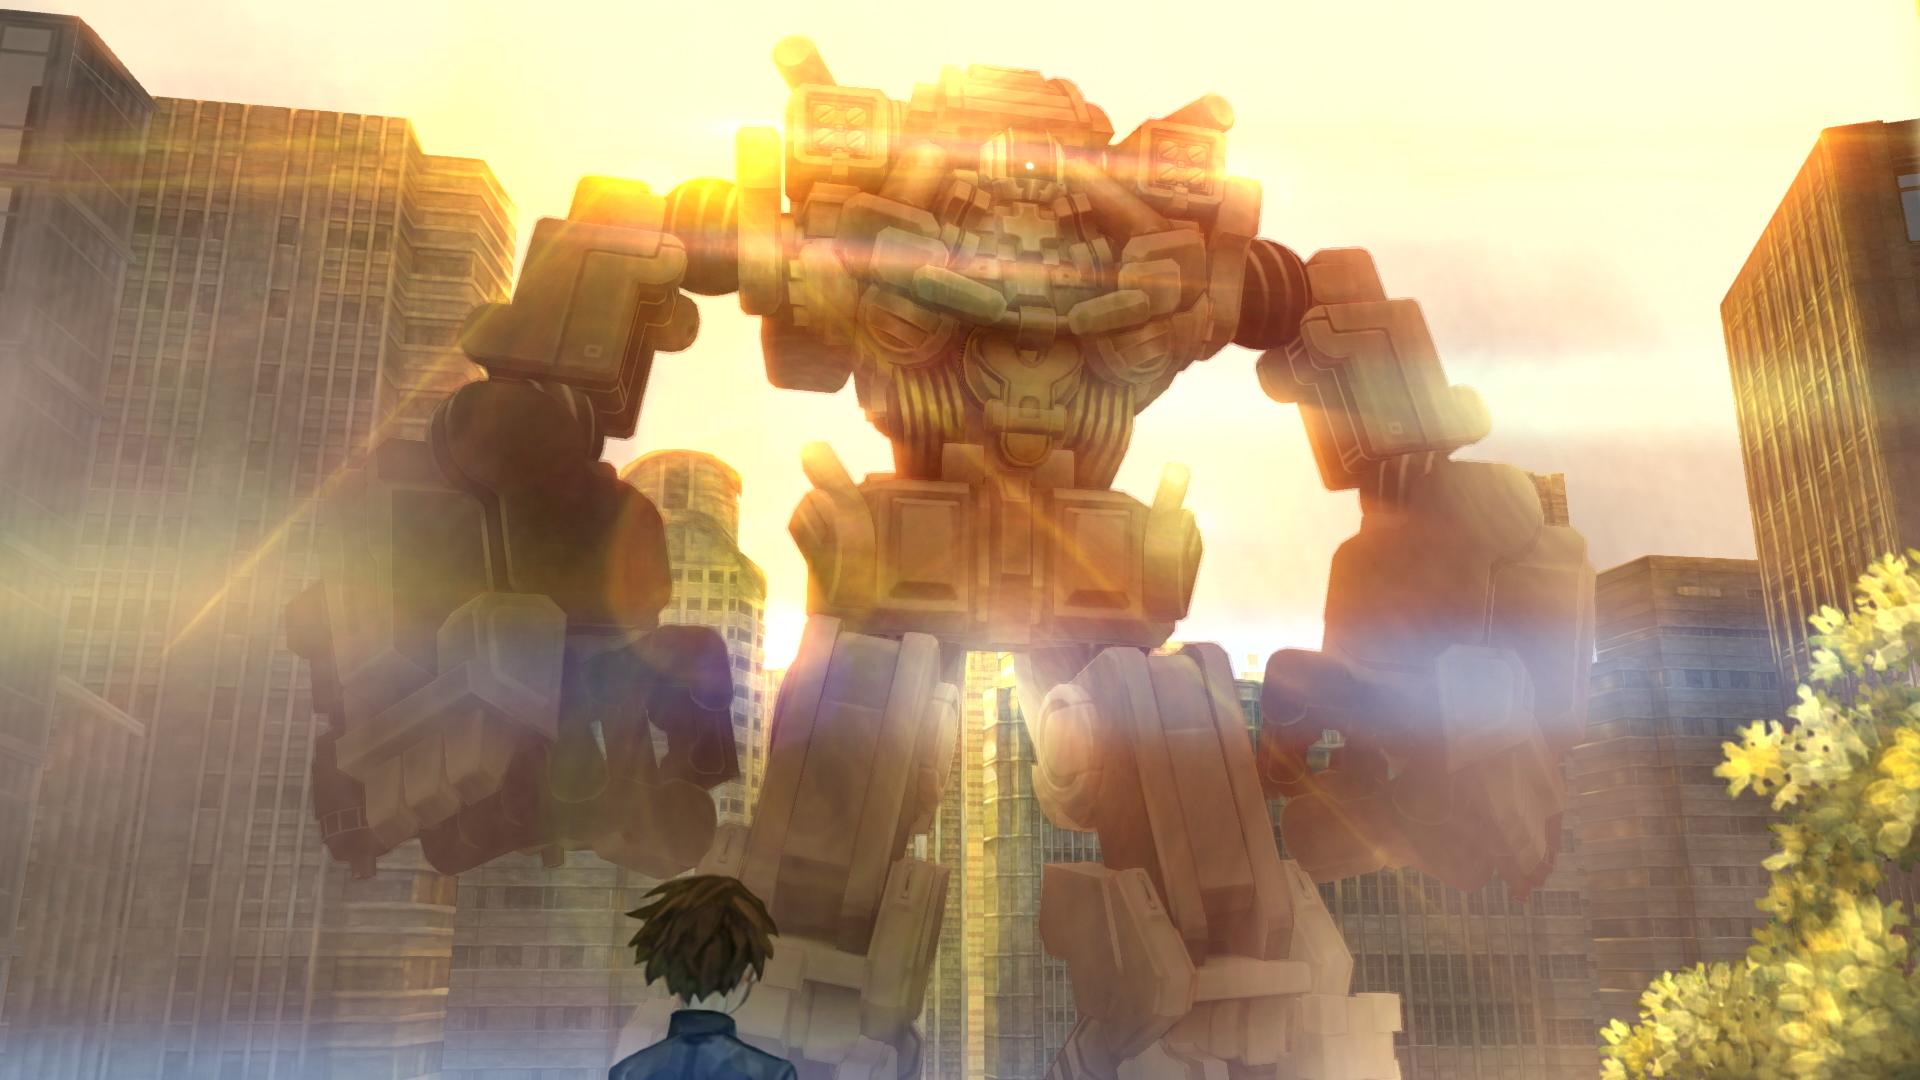 13 Sentinels Aegis Rim Screen 6